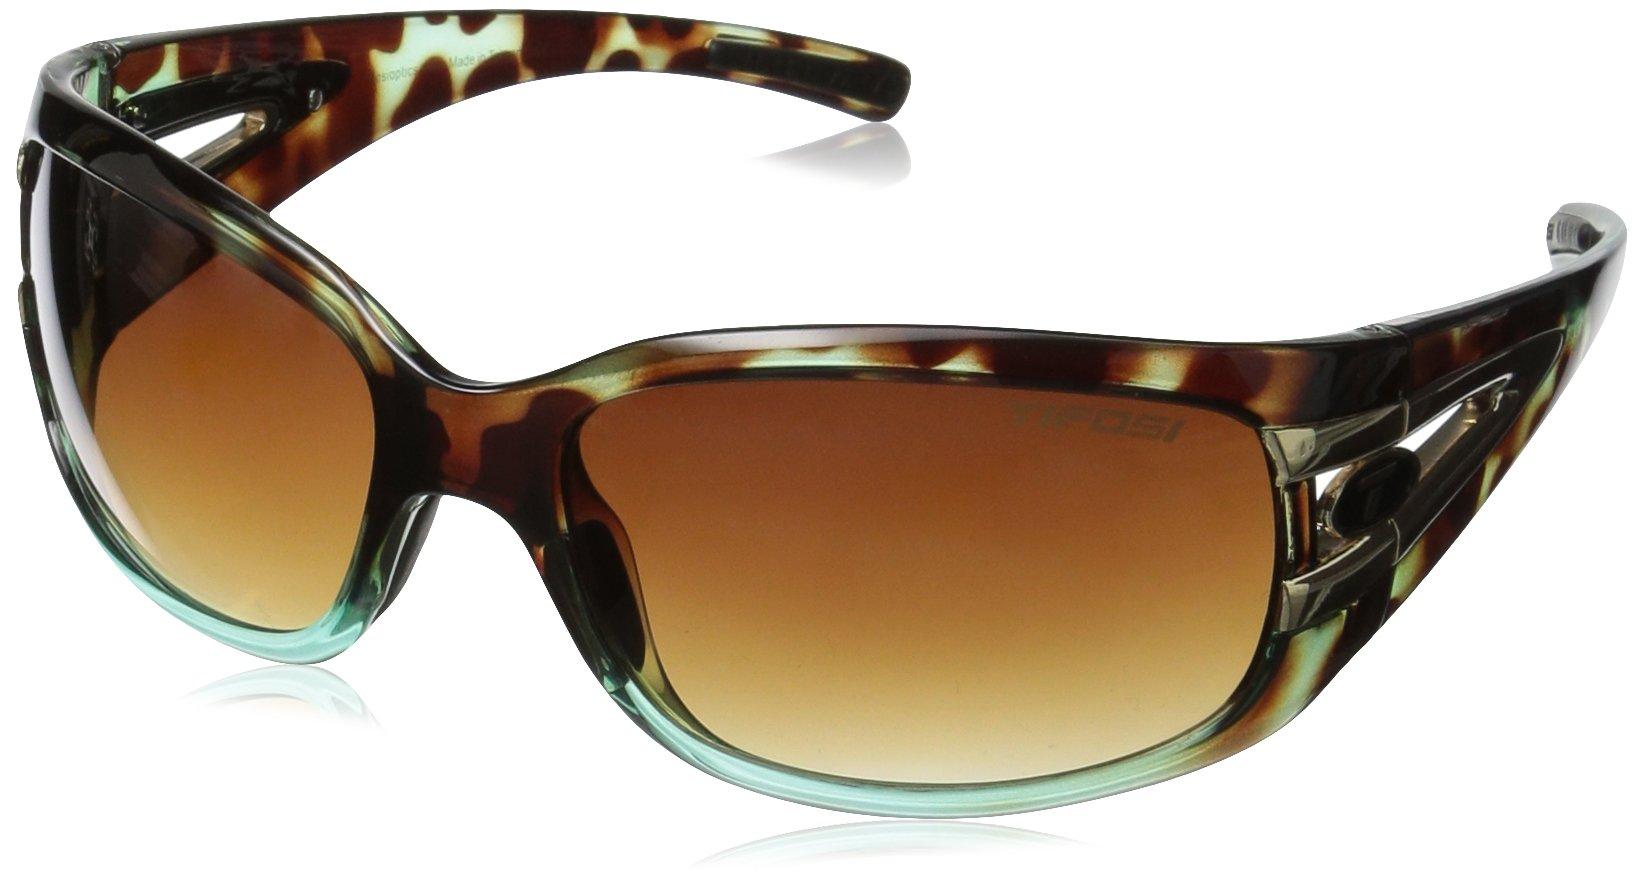 Tifosi Women's Lust Wrap Sunglasses Blue Tortoise 134 mm